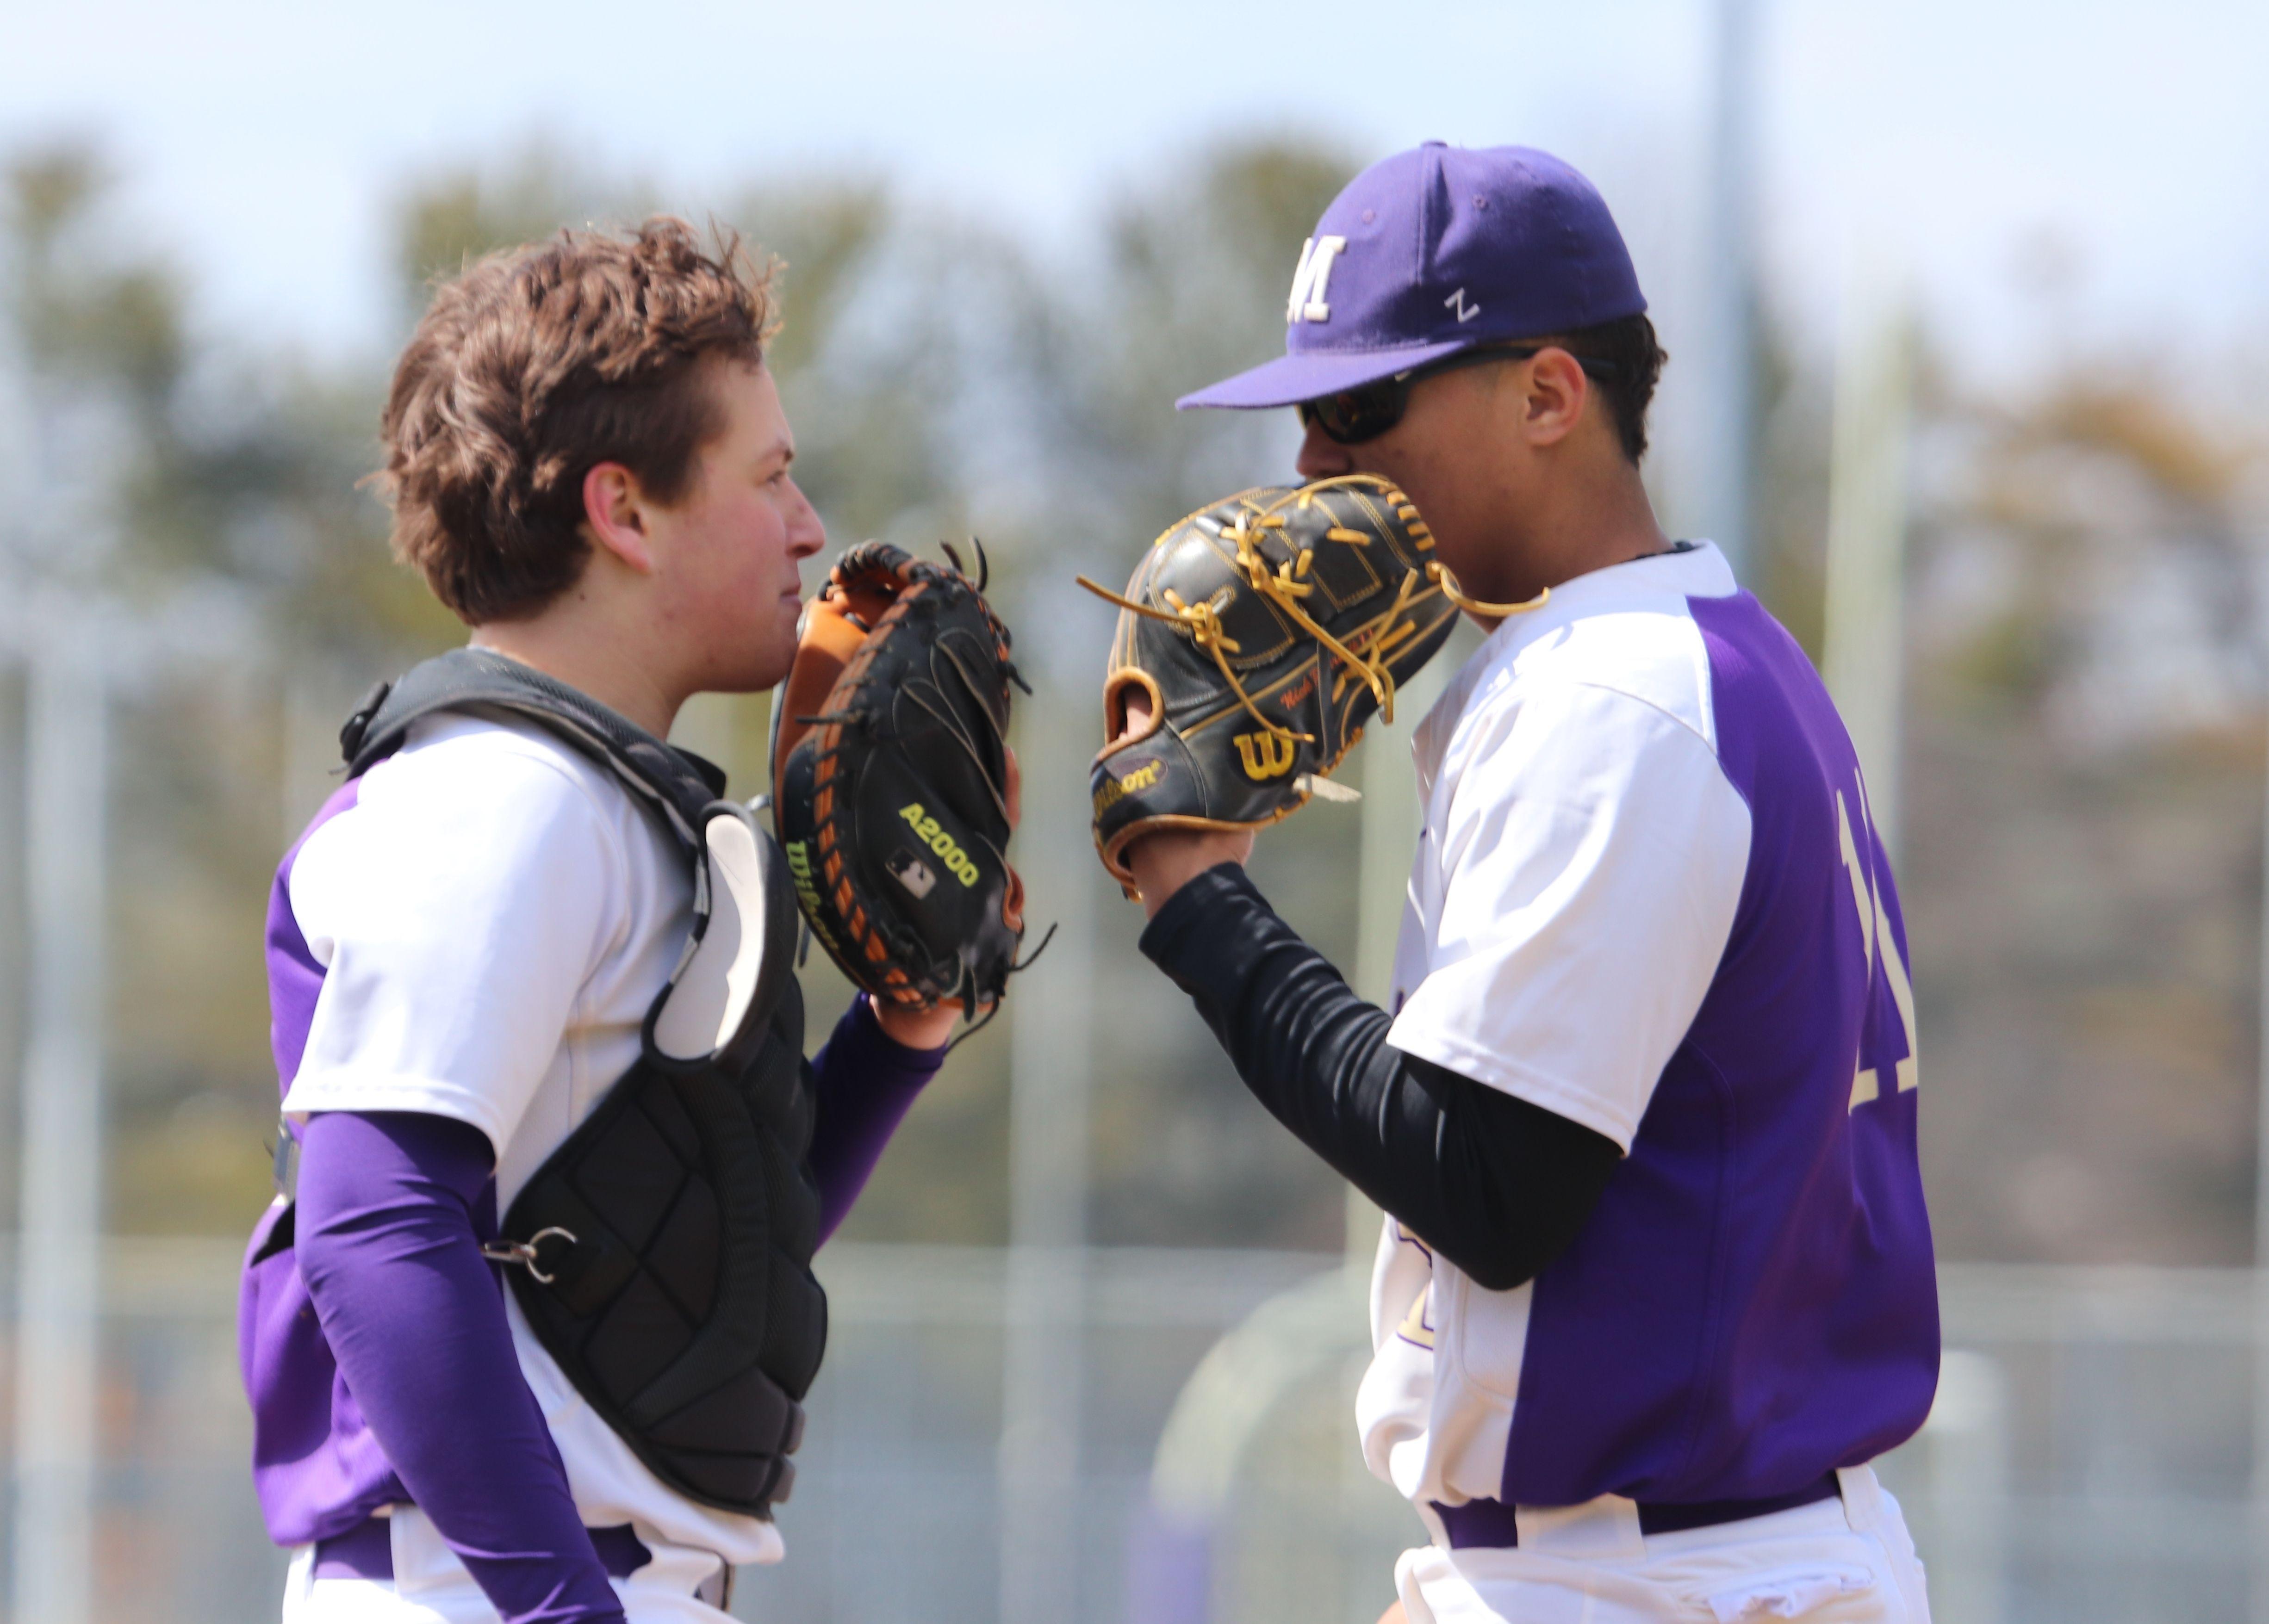 Jack Fitzgerald 2019 Baseball Catcher Monroe Township Nj Tri State Arsenal With Nick Payero Seton Hall Pitcher Baseball Catcher Jack Fitzgerald Fitzgerald